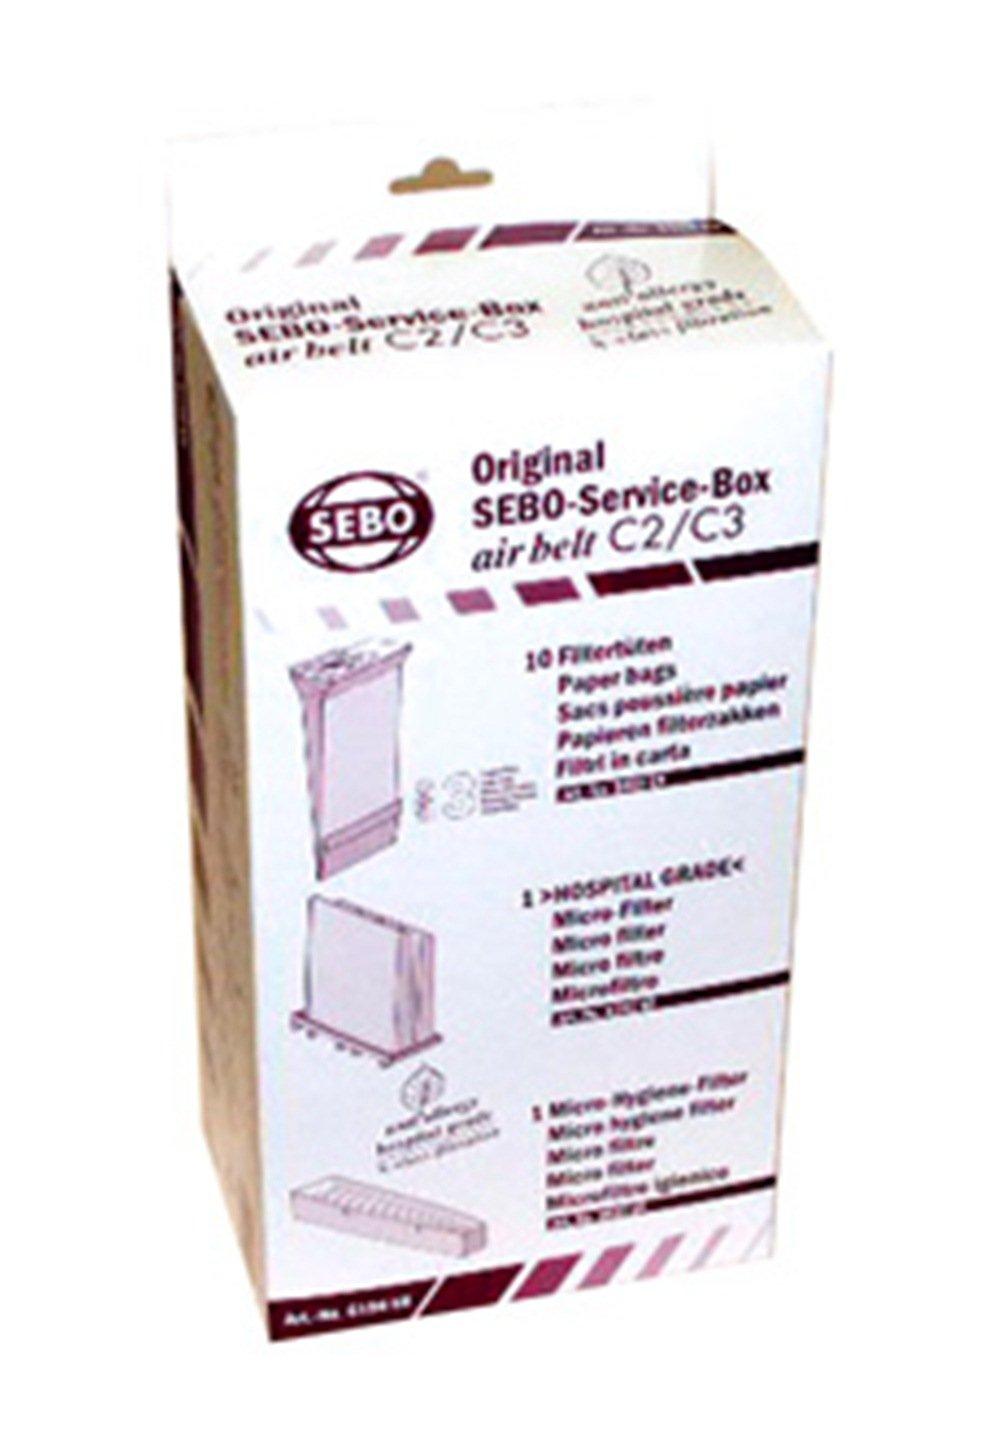 Sebo 6198AM Service Box for C Series Vacuum by Sebo